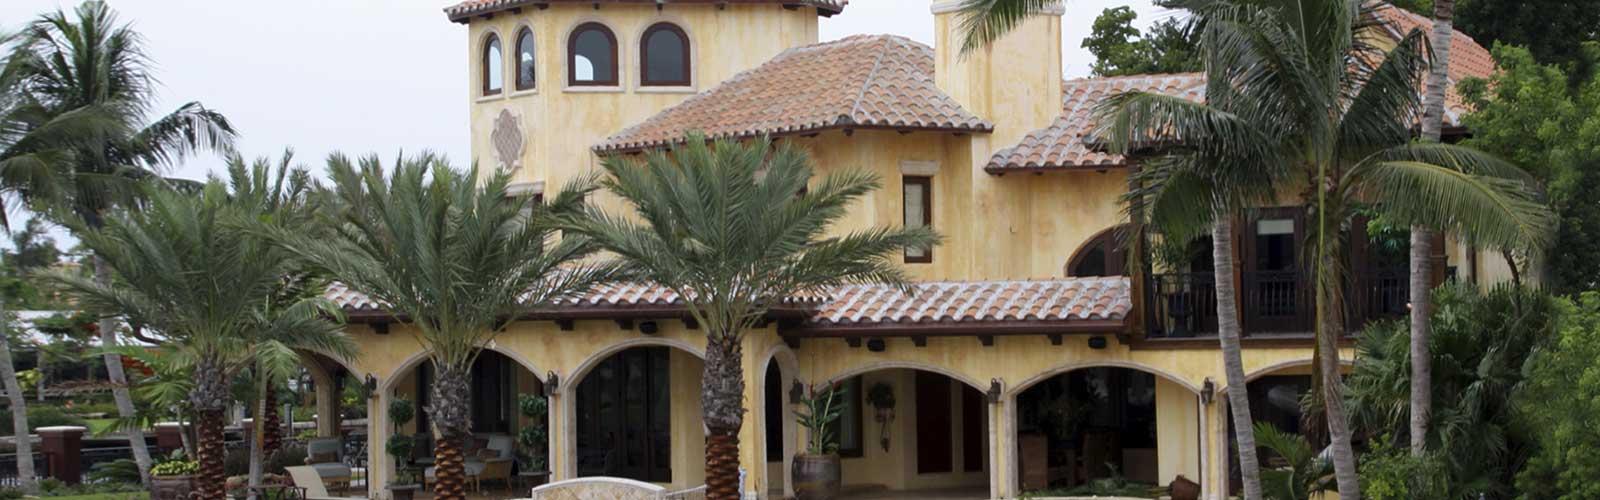 Immobilien Naples - Strand Immobilien - Hauskauf Olde Naples Florida